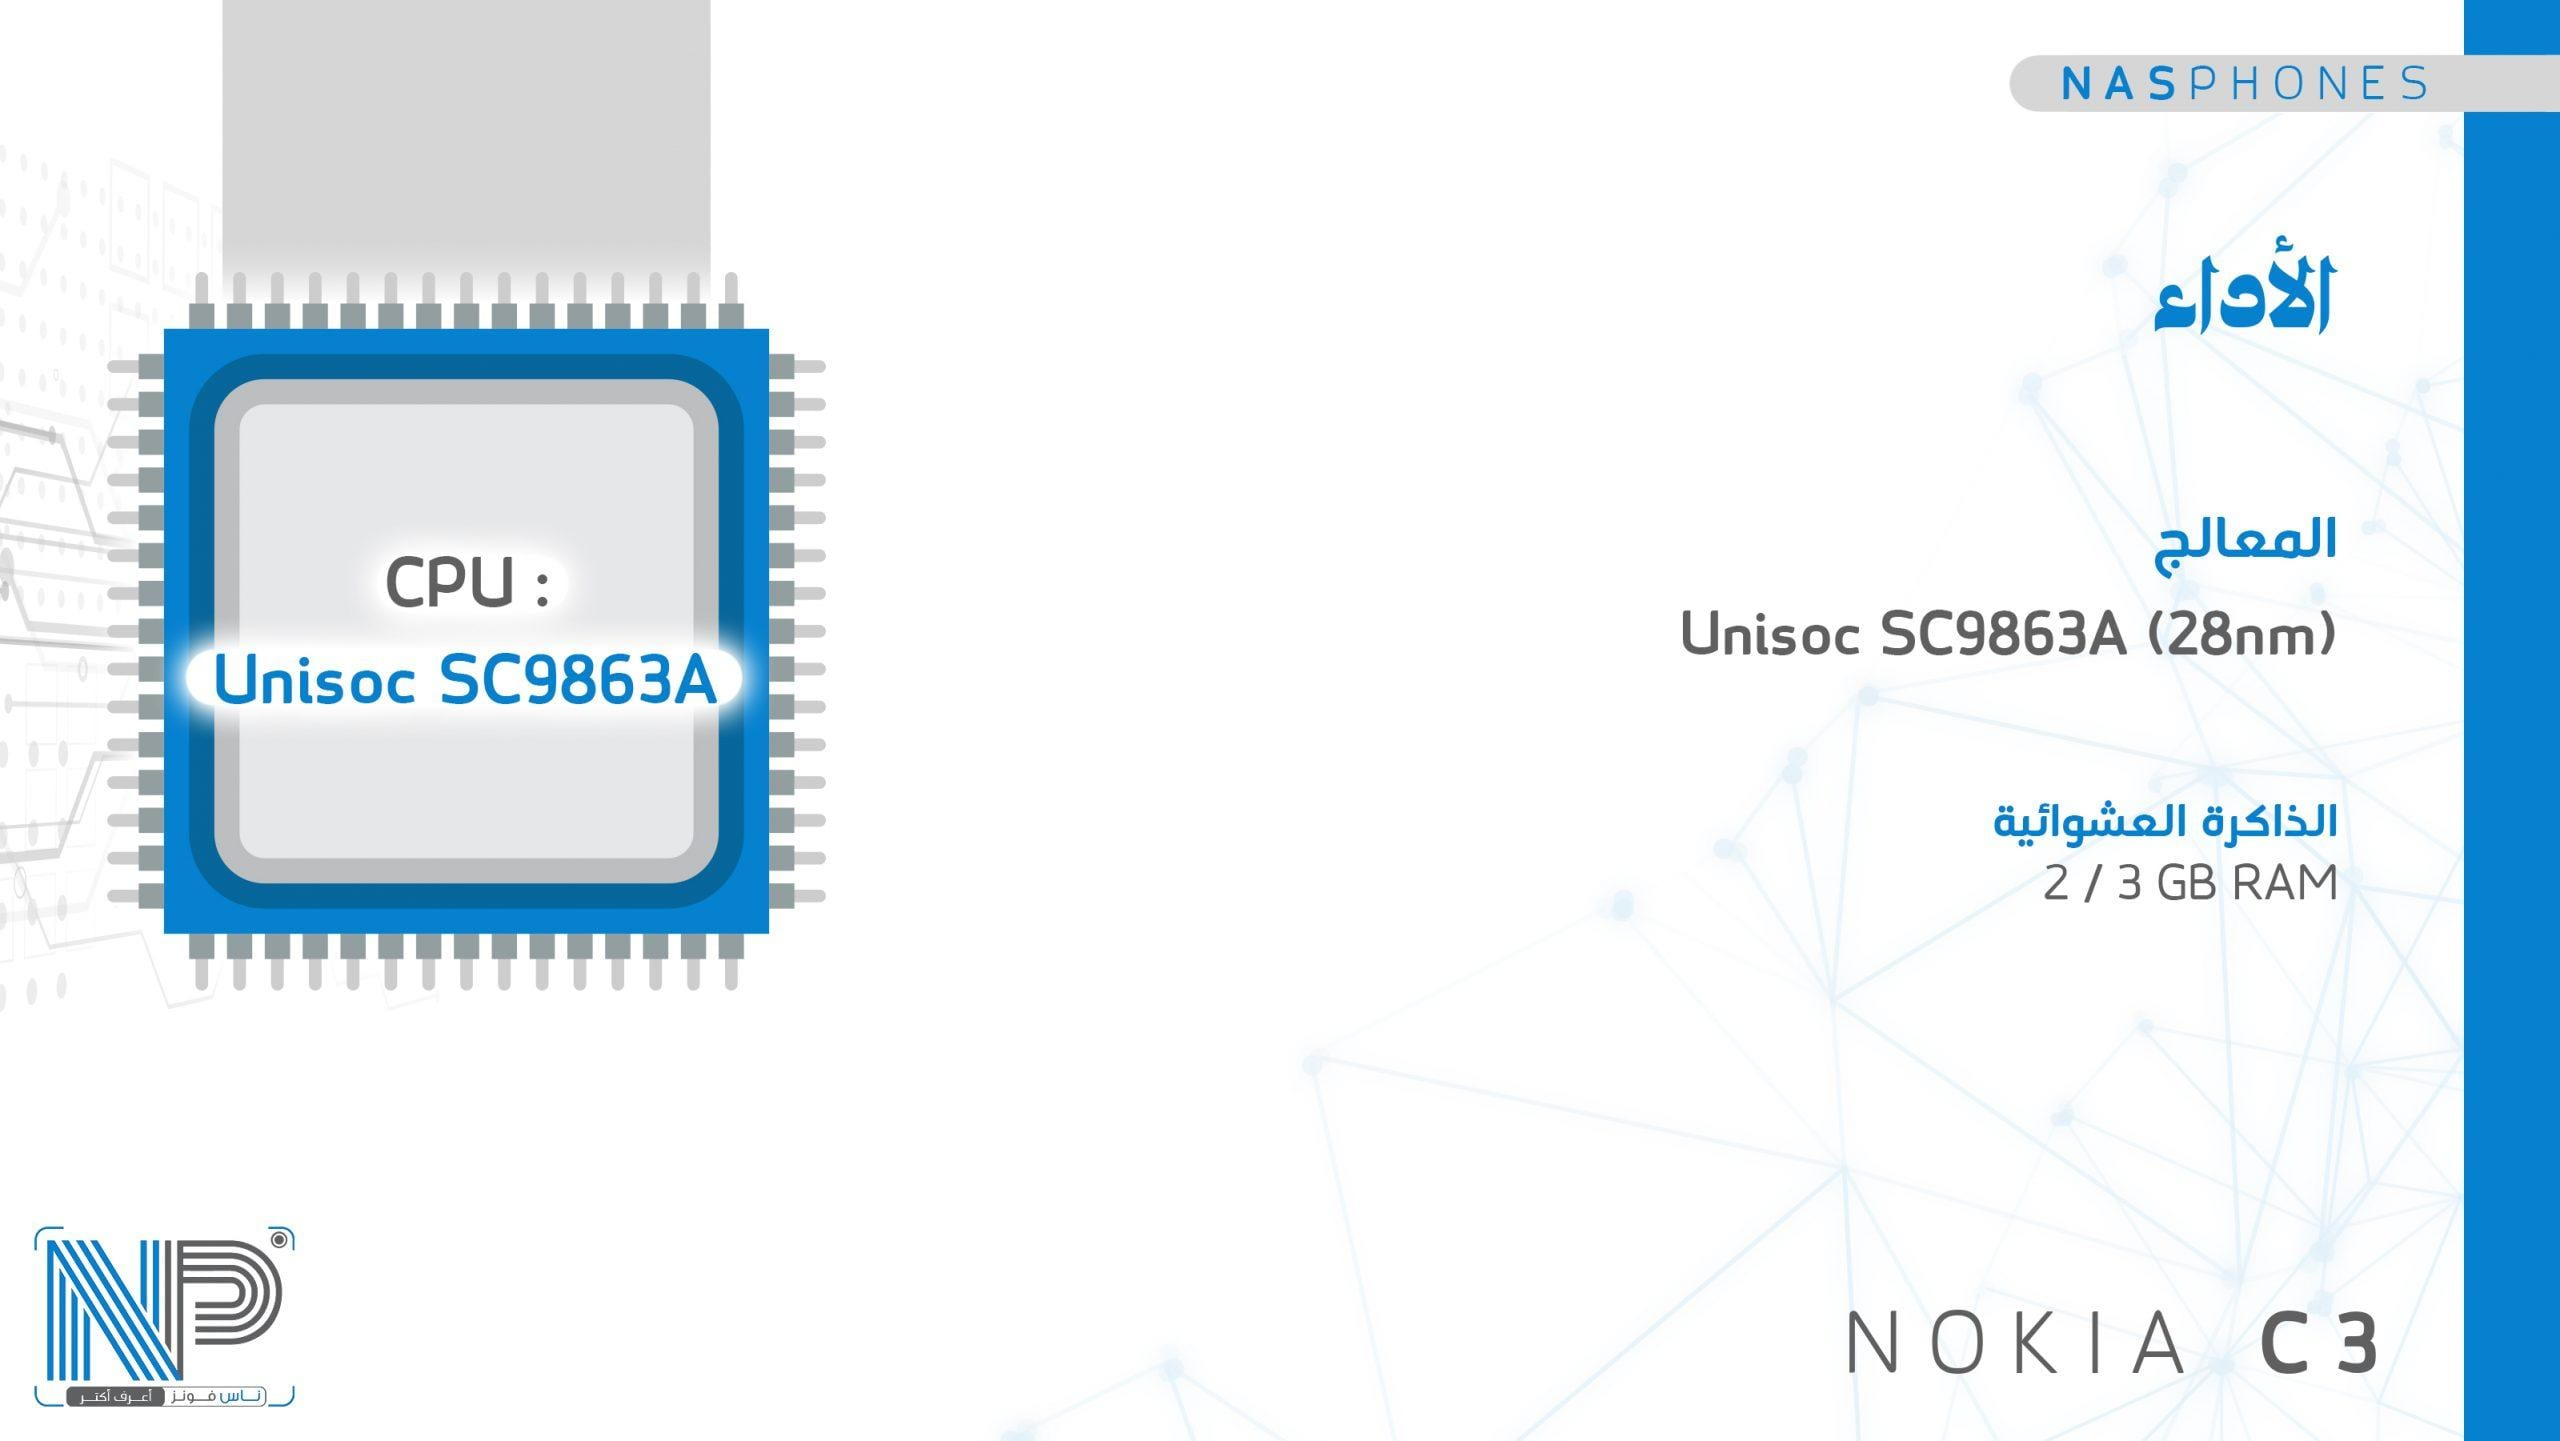 أداء موبايل Nokia C3